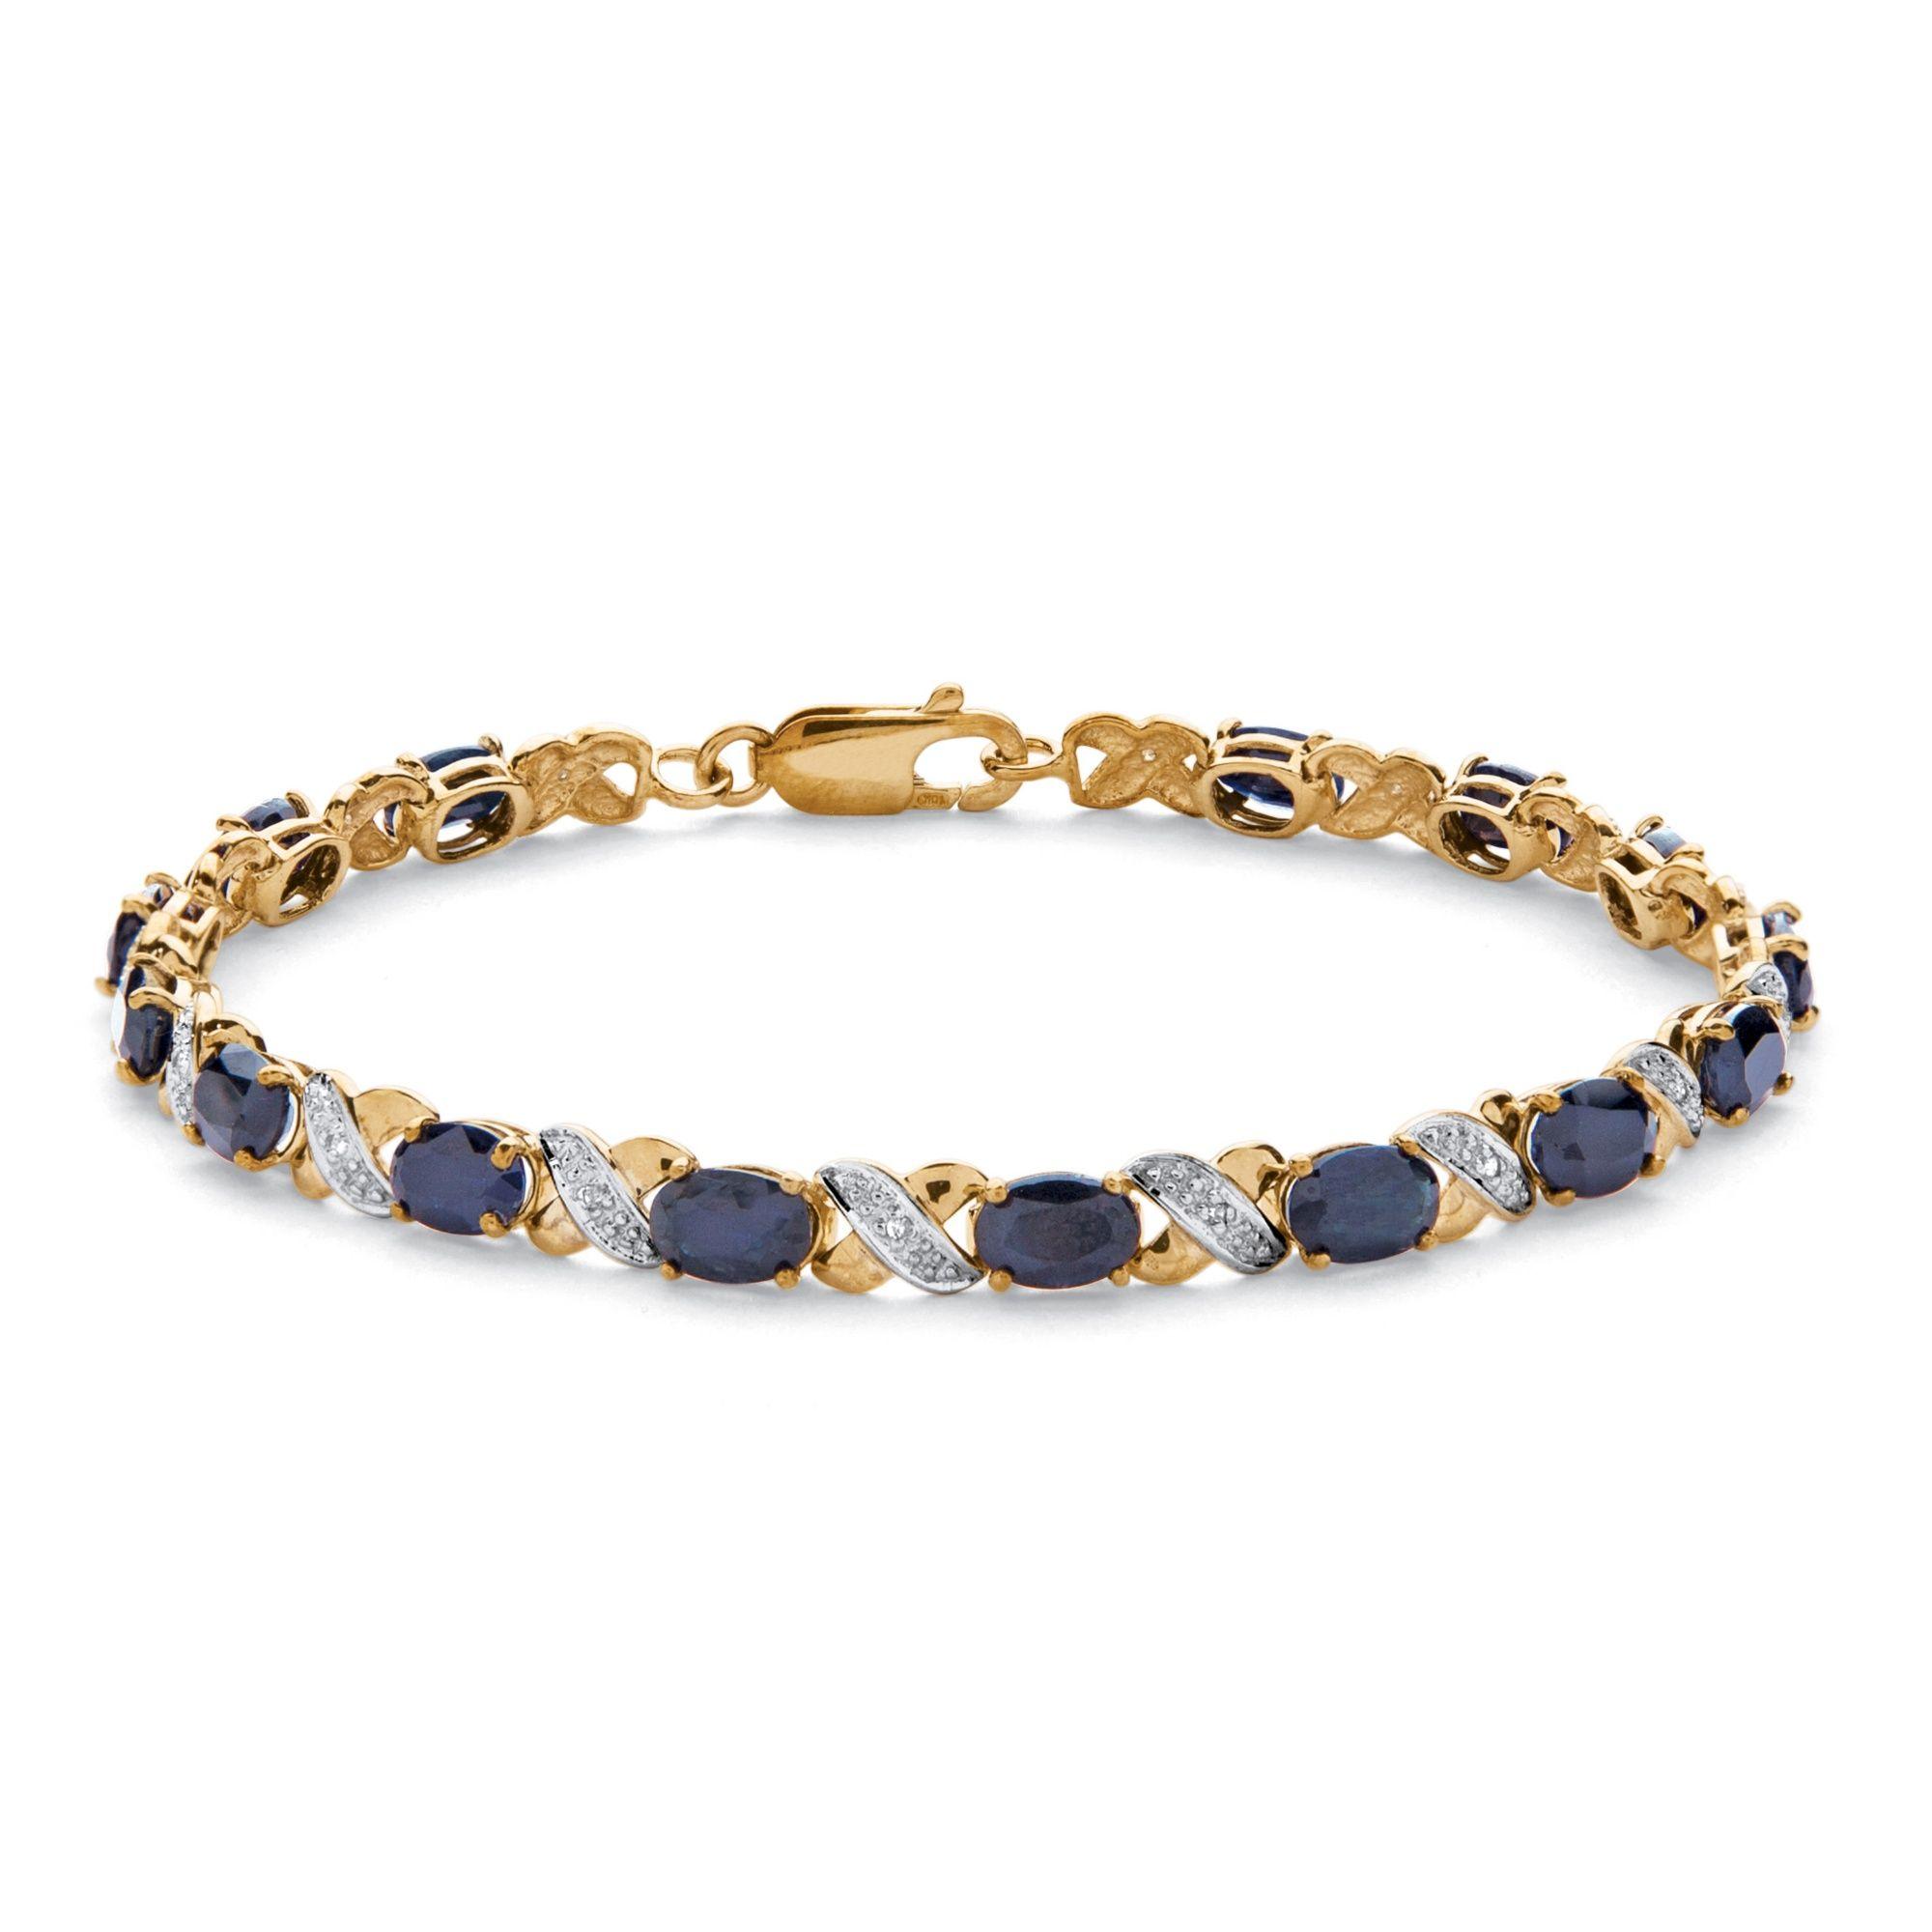 A fashionable lifestyle needs a fabulous X & O tennis bracelet like our blue sapphire beauty, 8.40 carats T.W., all chic-IRyZTtd3